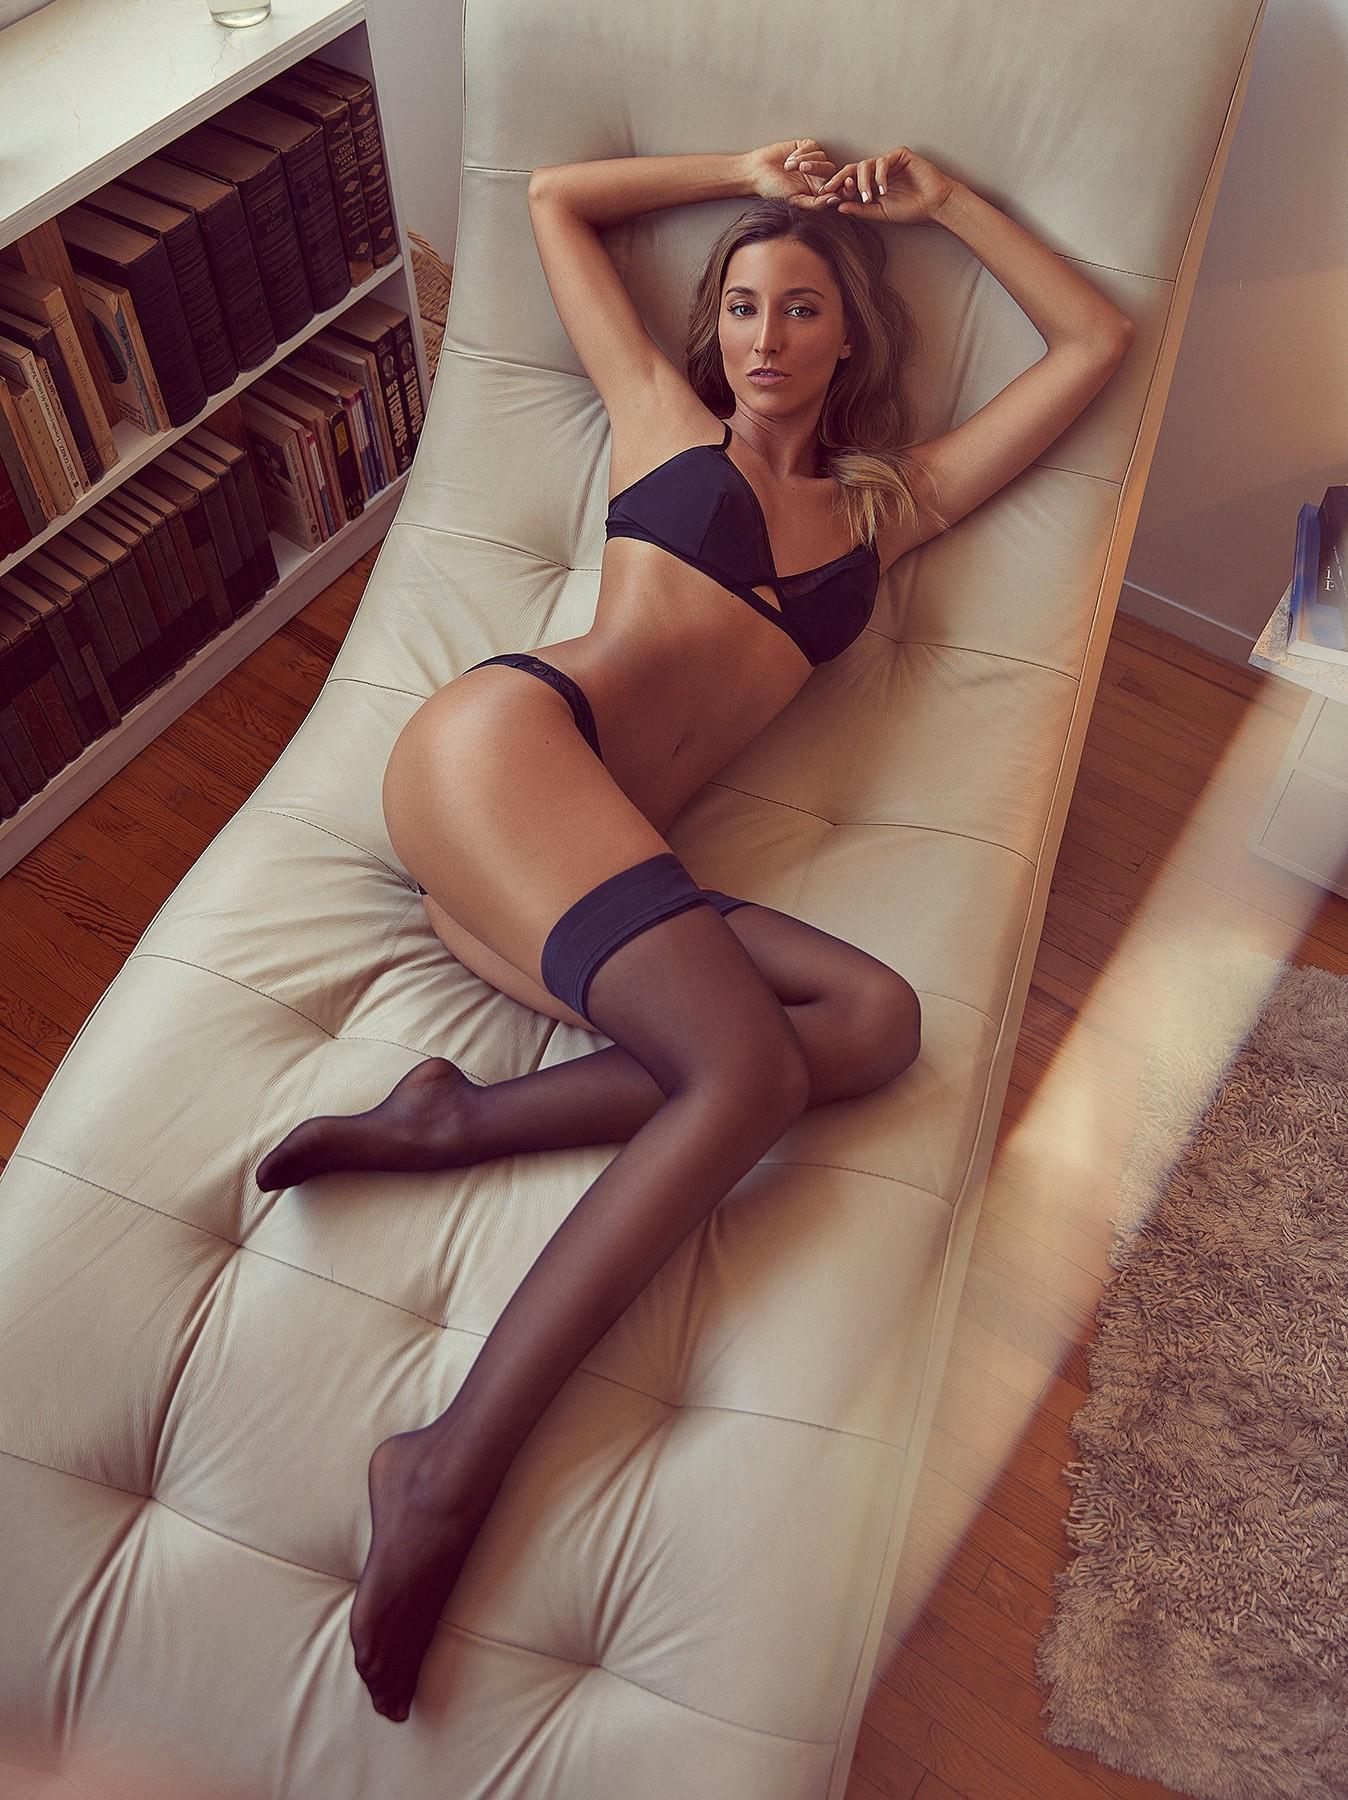 Sofa Sisniega Desnuda - Fotos Y Vdeos - Imperiodefamosas-4887